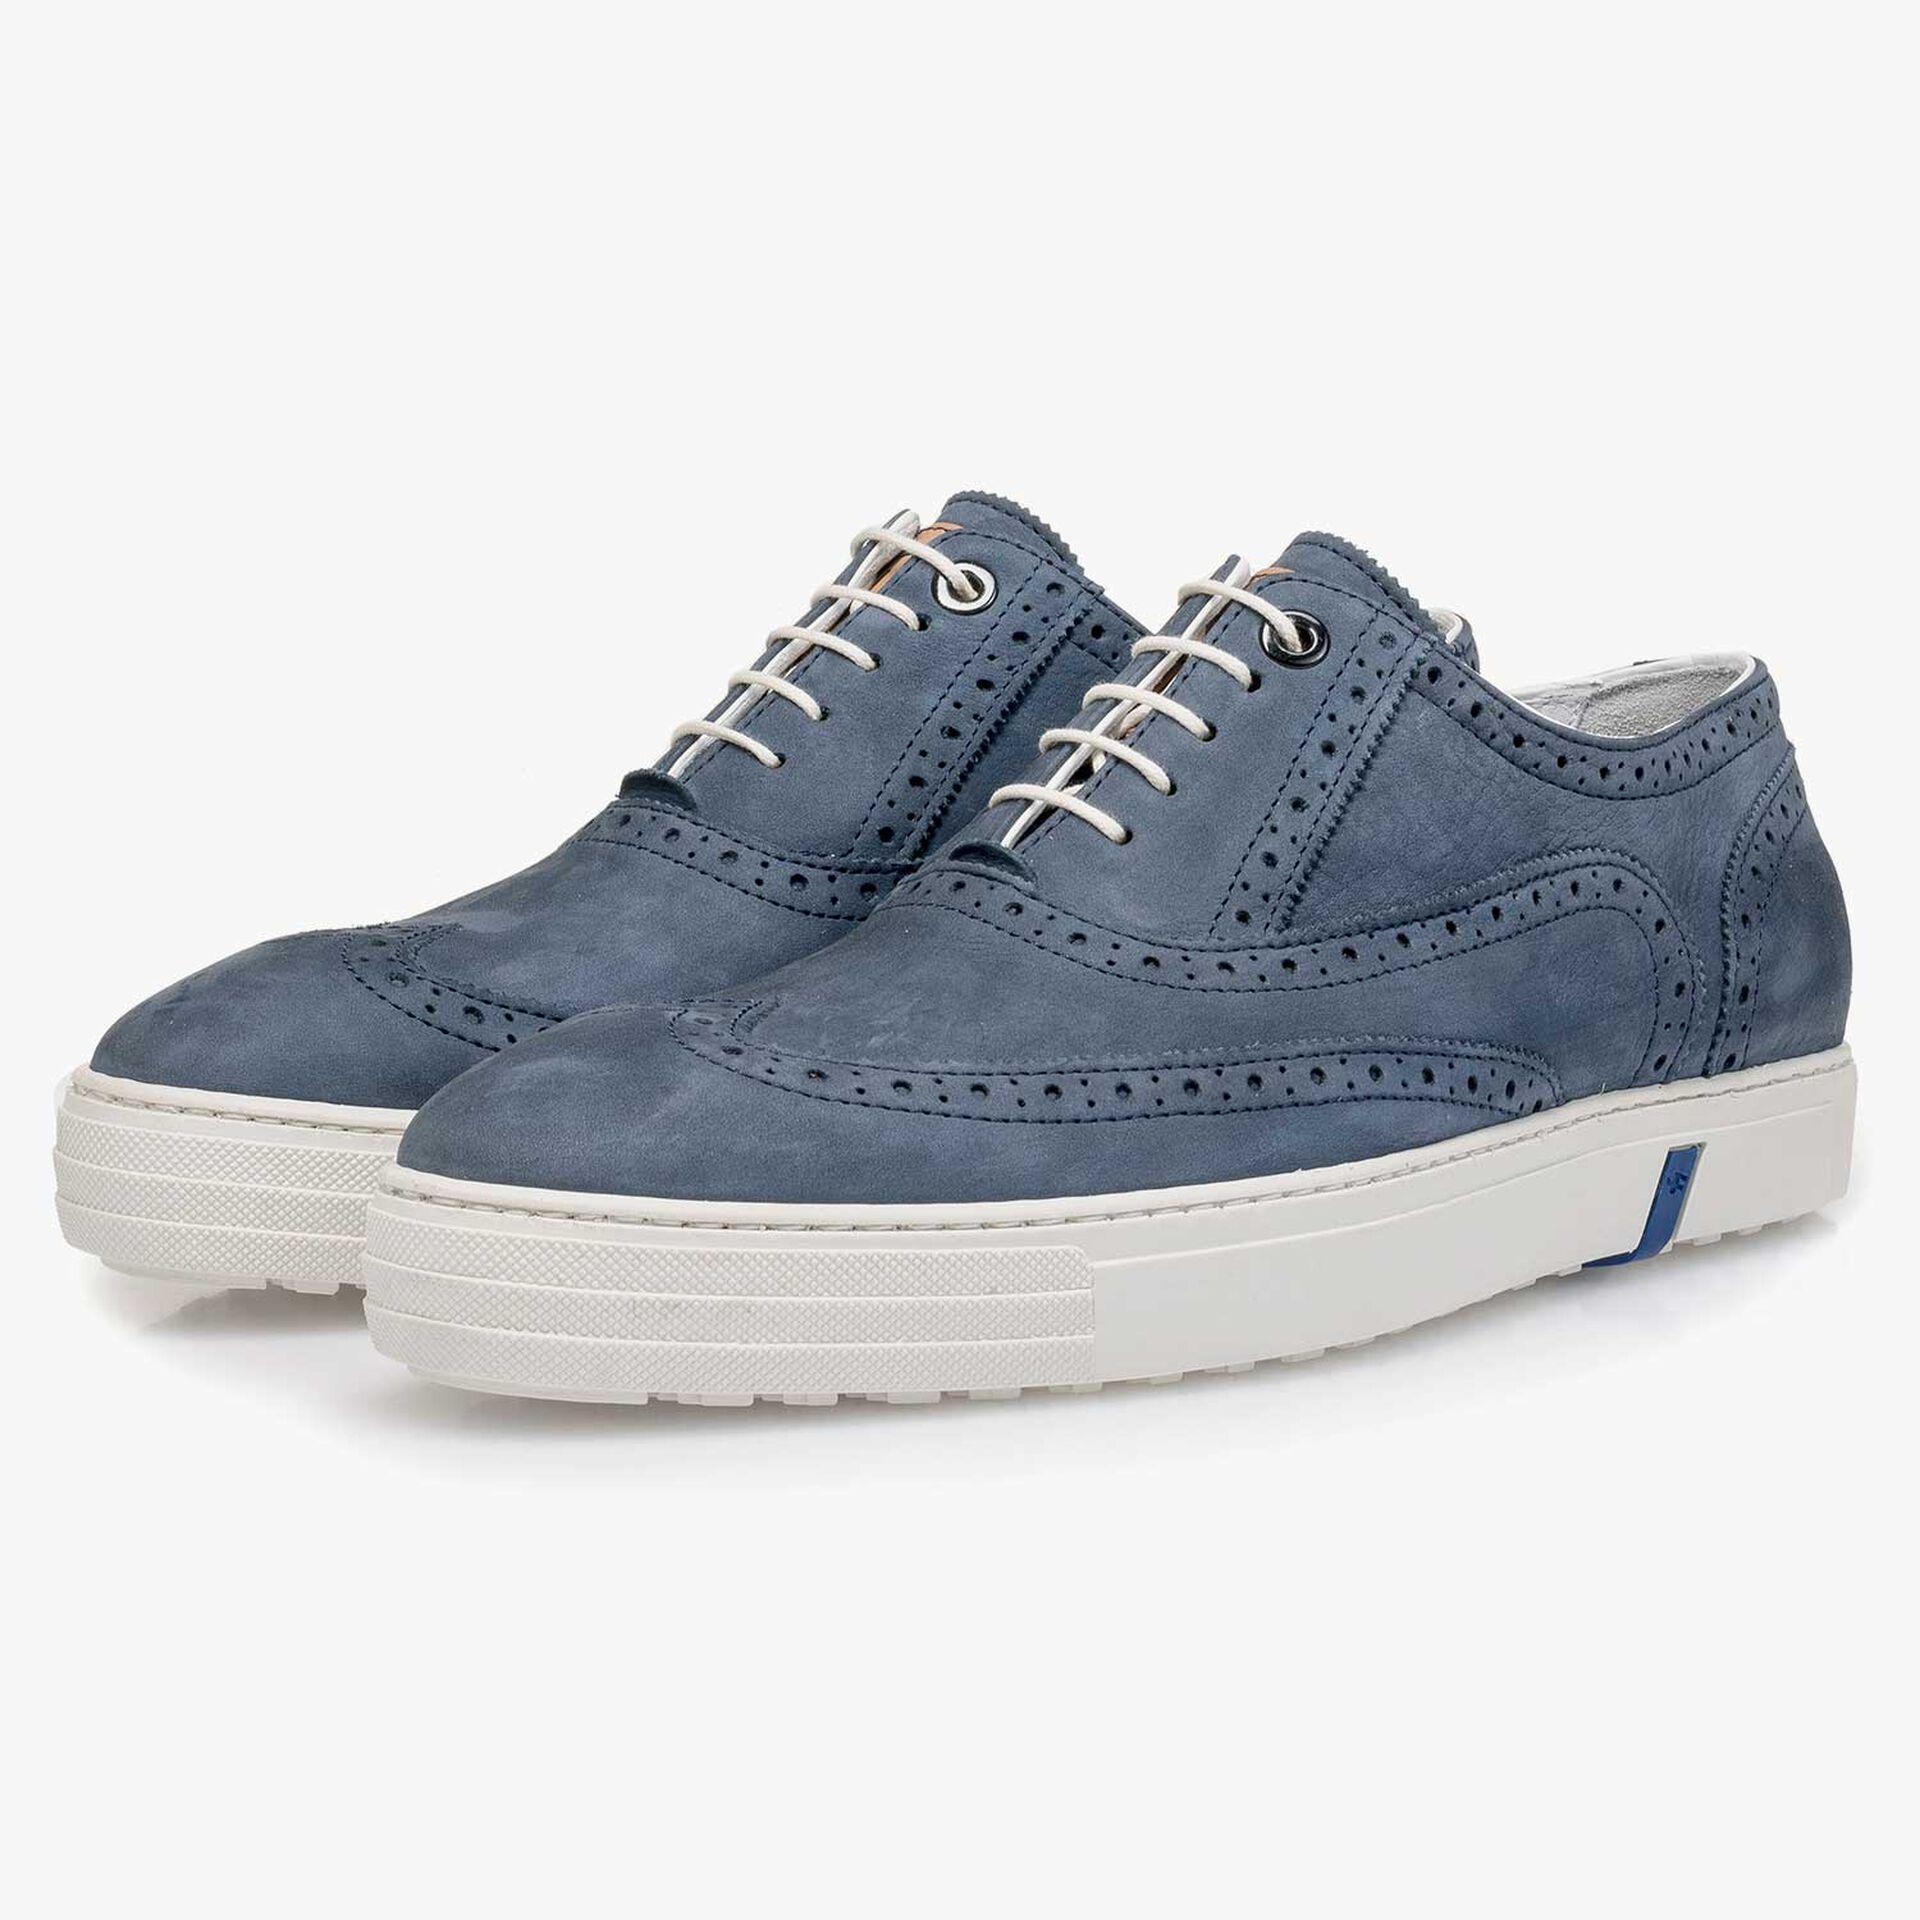 Blue nubuck leather brogue shoe